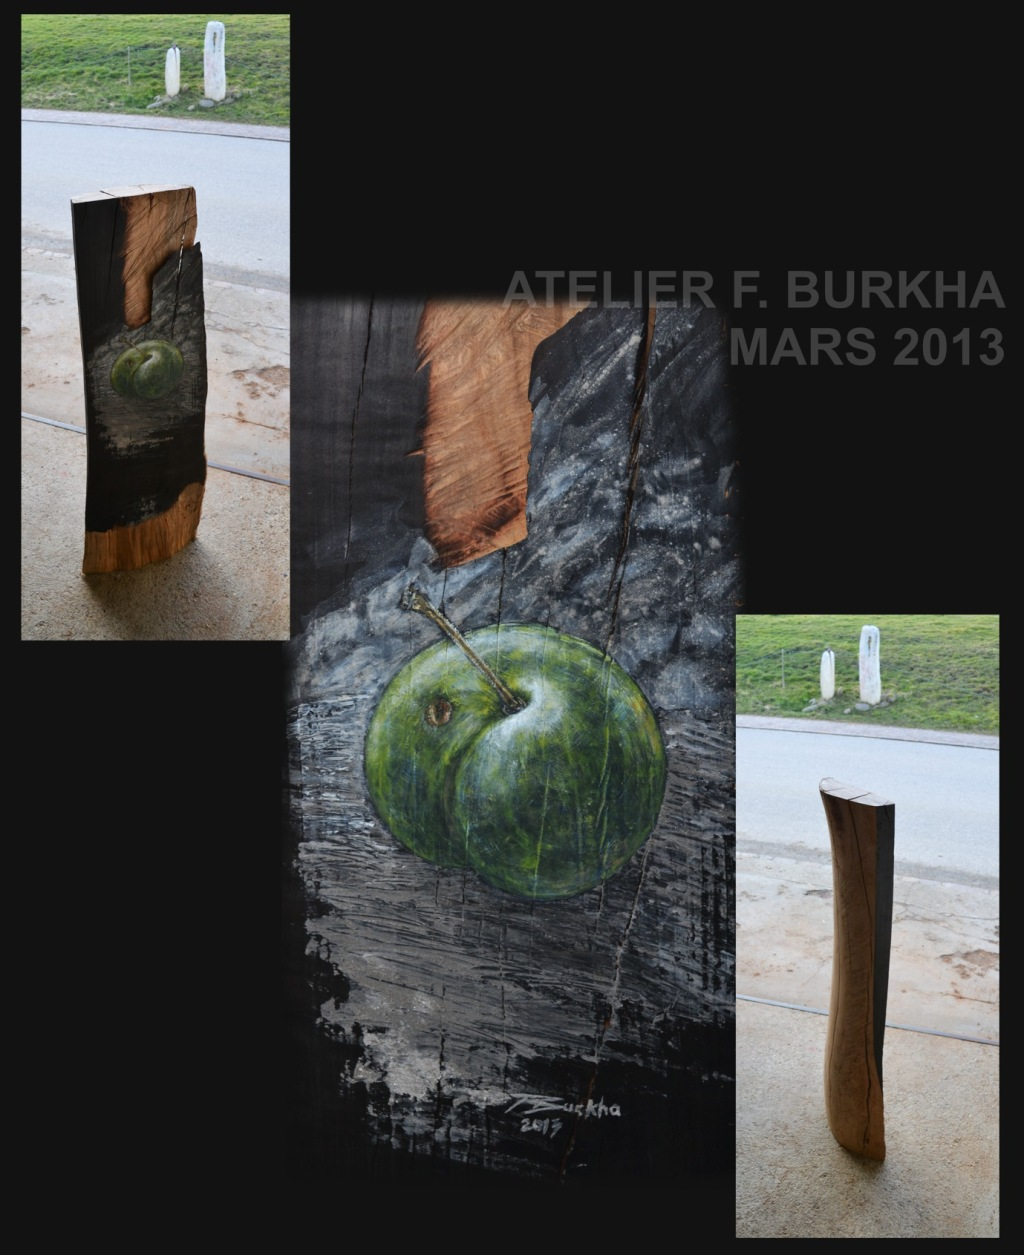 ATELIER-F-BURKHA-MARS-2013_CENDRE